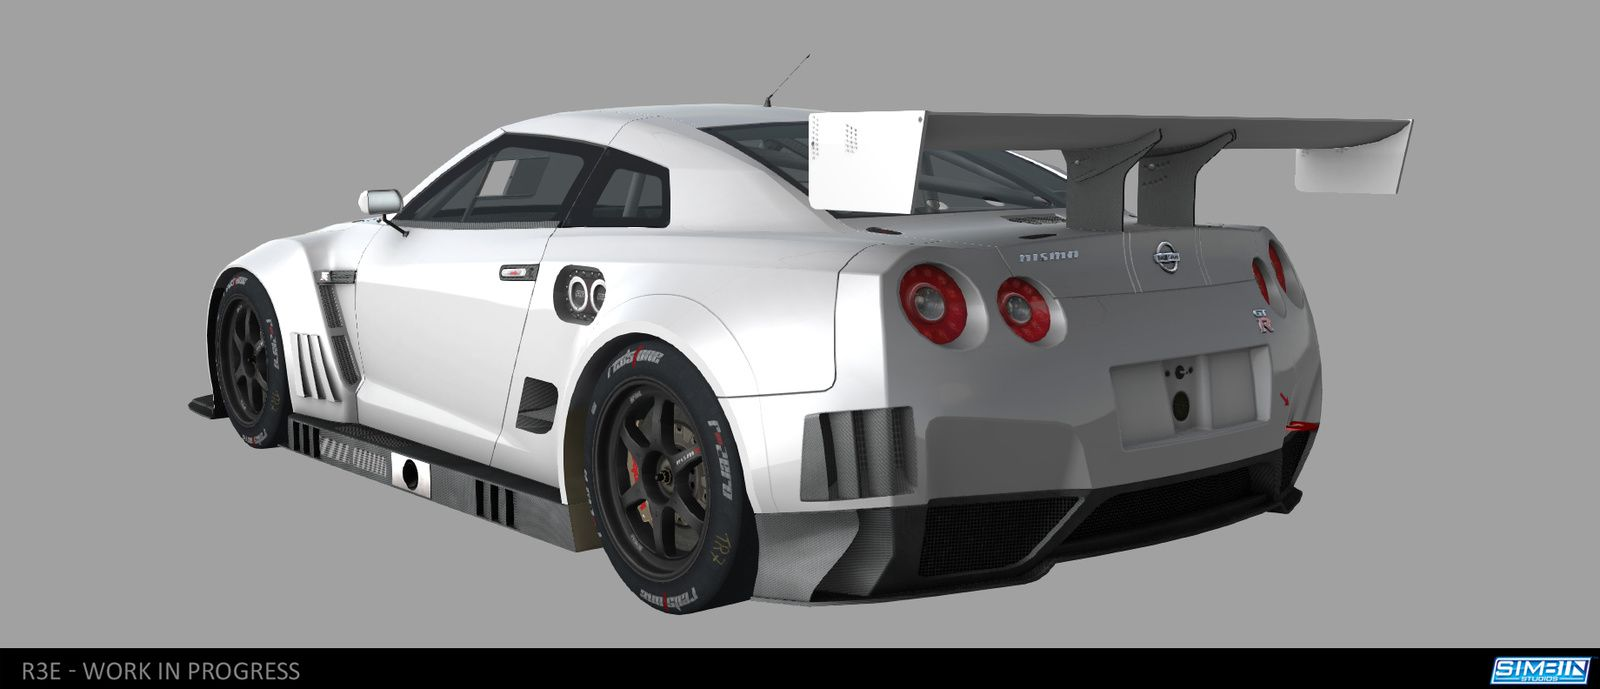 A venir dans RaceRoom Racing Experience